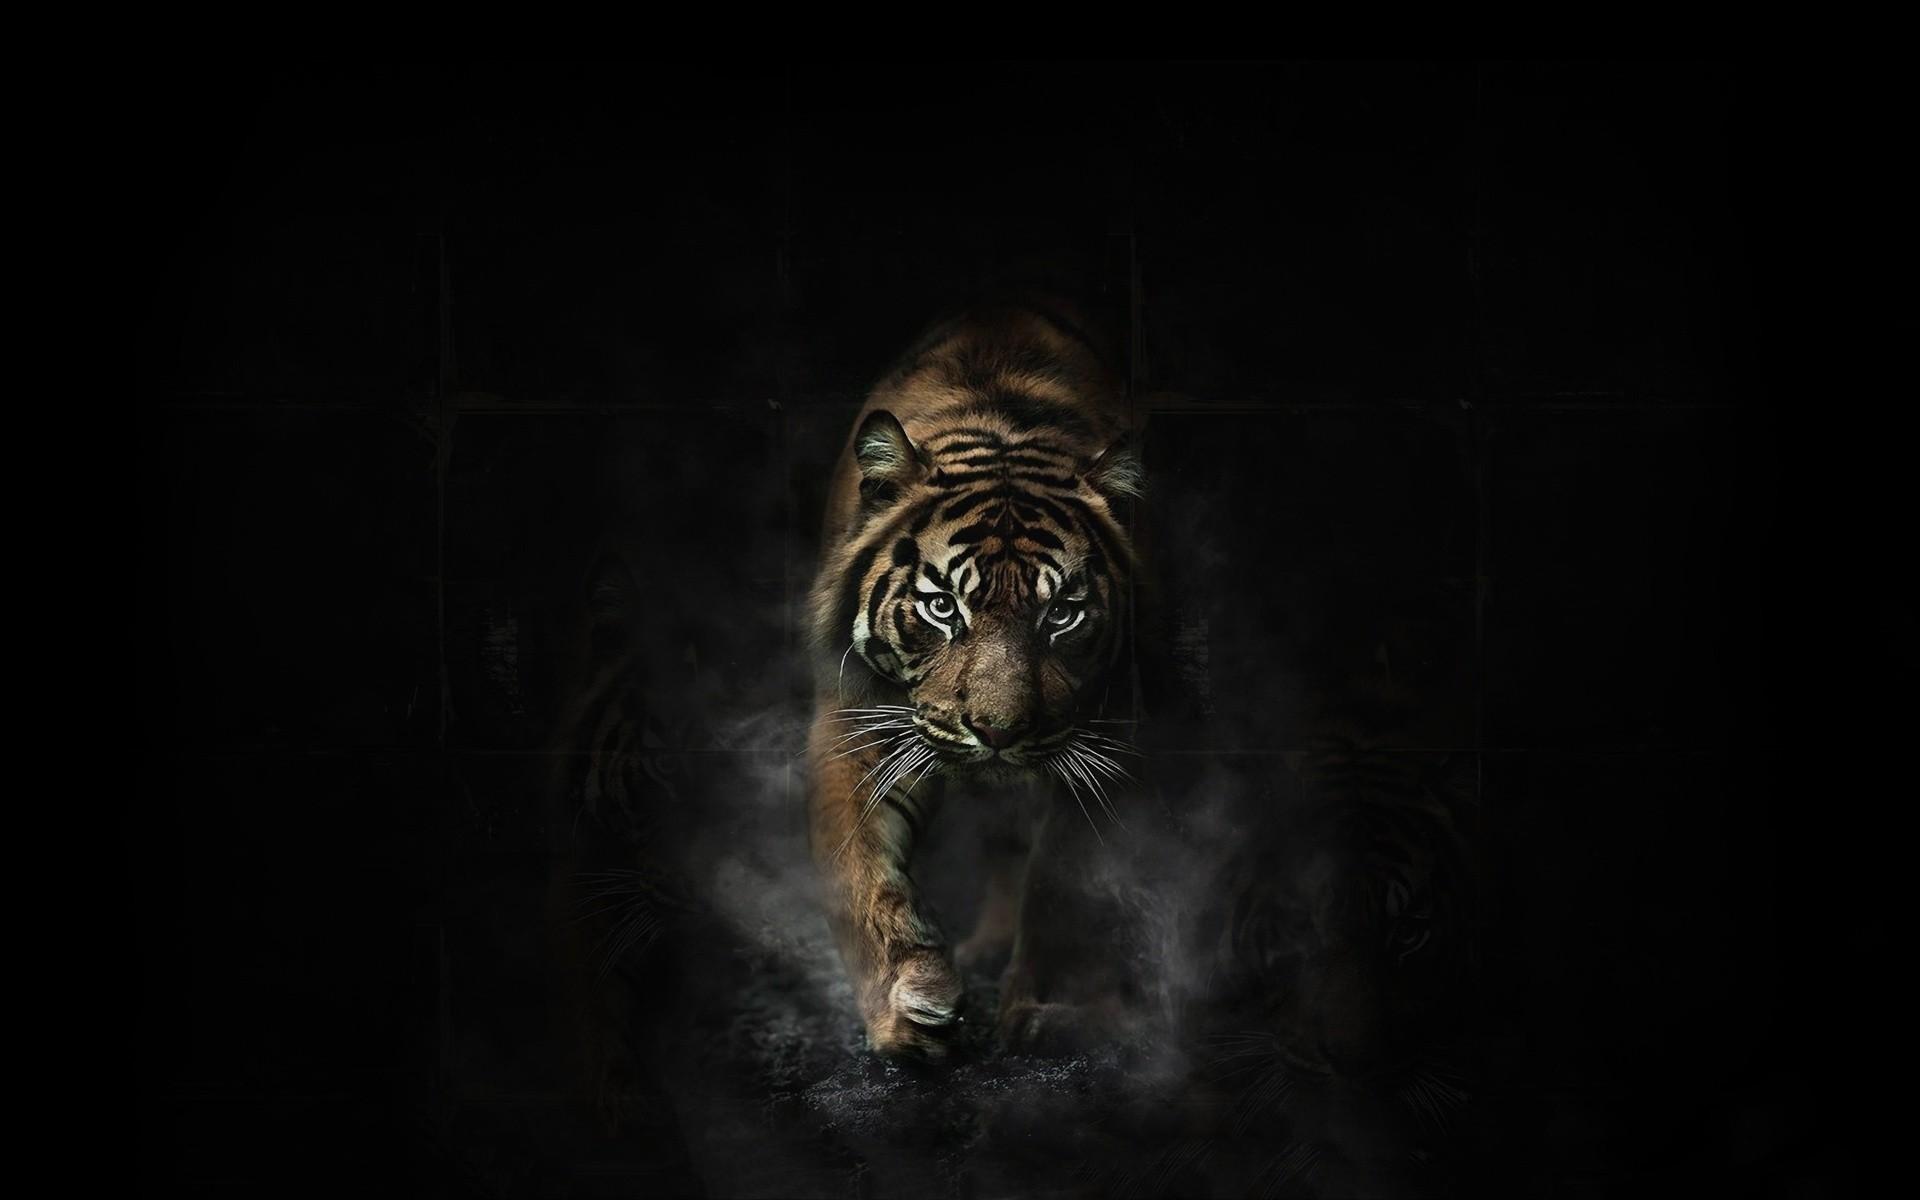 Tiger Wallpapers Best Wallpapers 1920×1200 Tigar Wallpapers (32 Wallpapers)  | Adorable Wallpapers